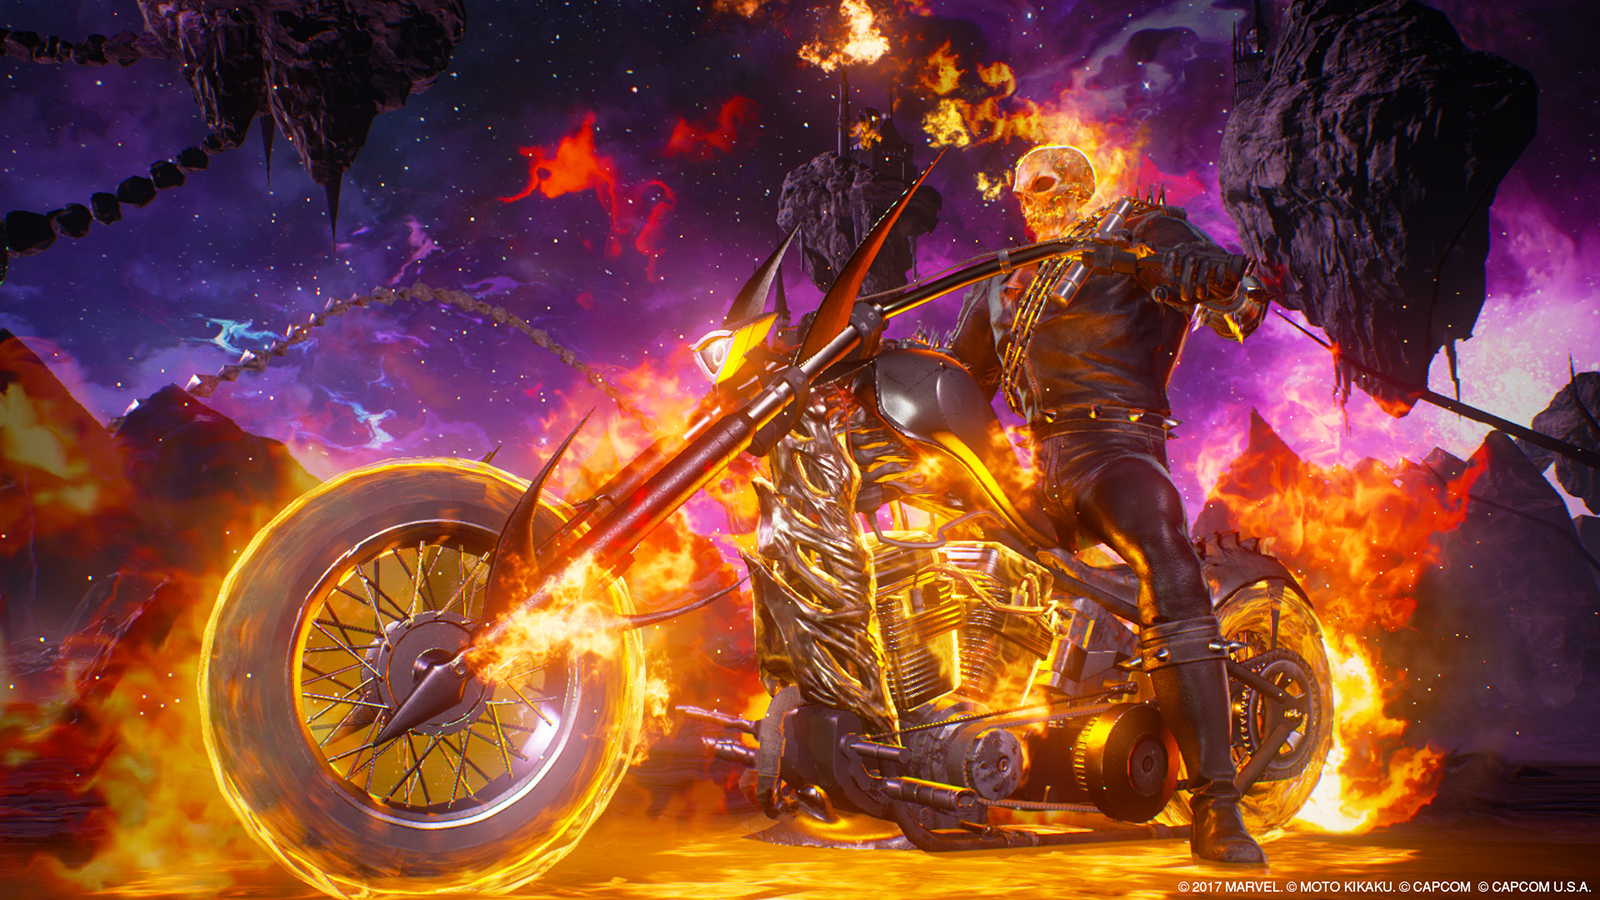 Razer is making some Marvel vs. Capcom: Infinite arcade sticks screenshot